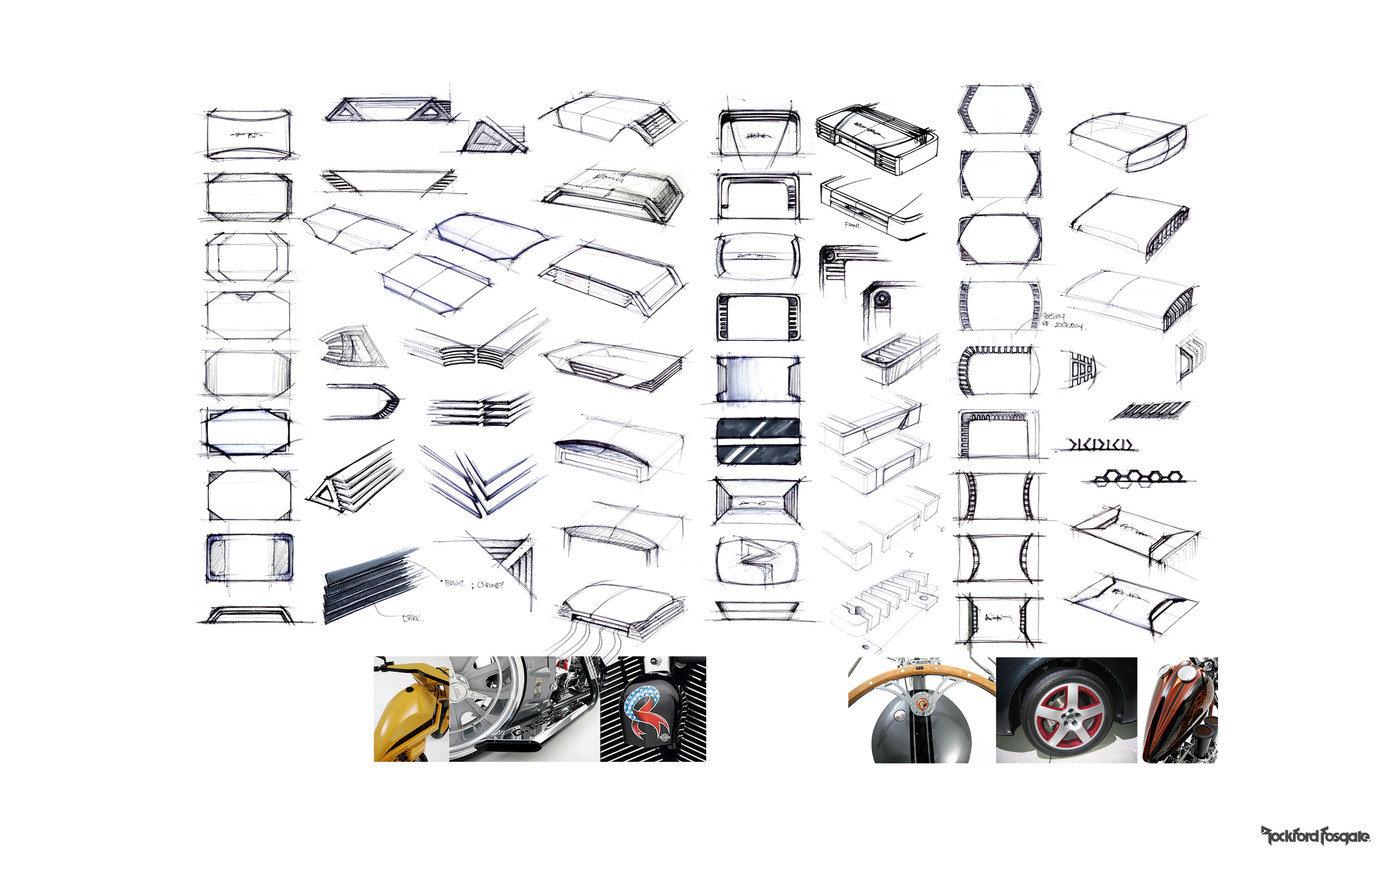 Rockford Fosgate Car Audio by kit mok at Coroflot.com